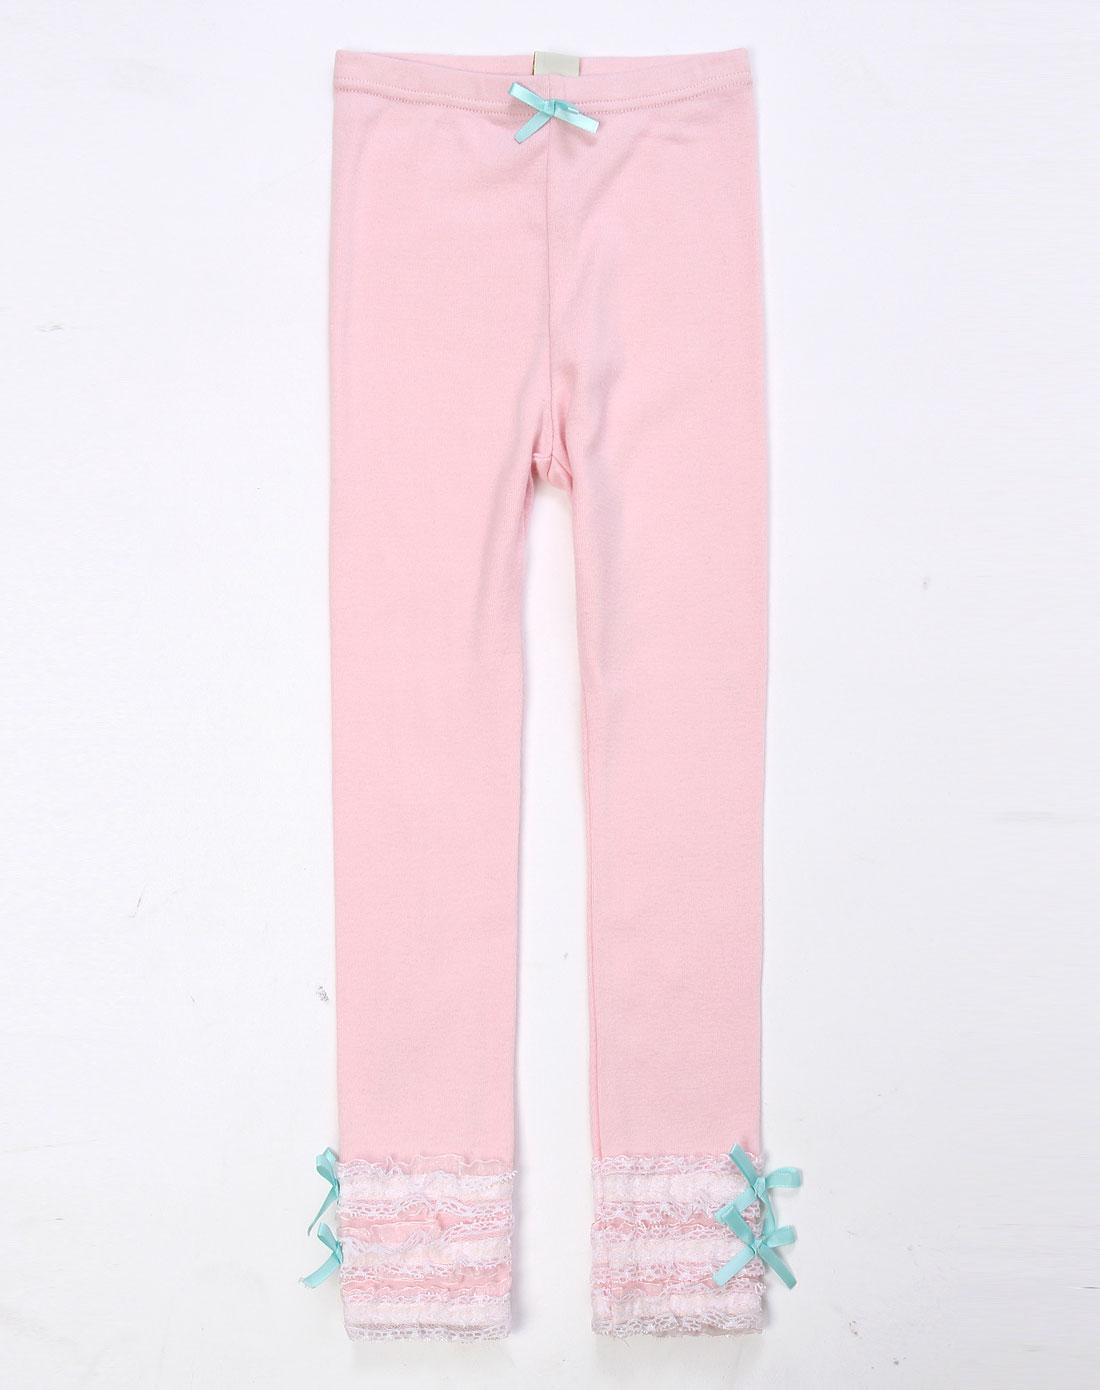 ciel女童粉色裤子gps1556pi